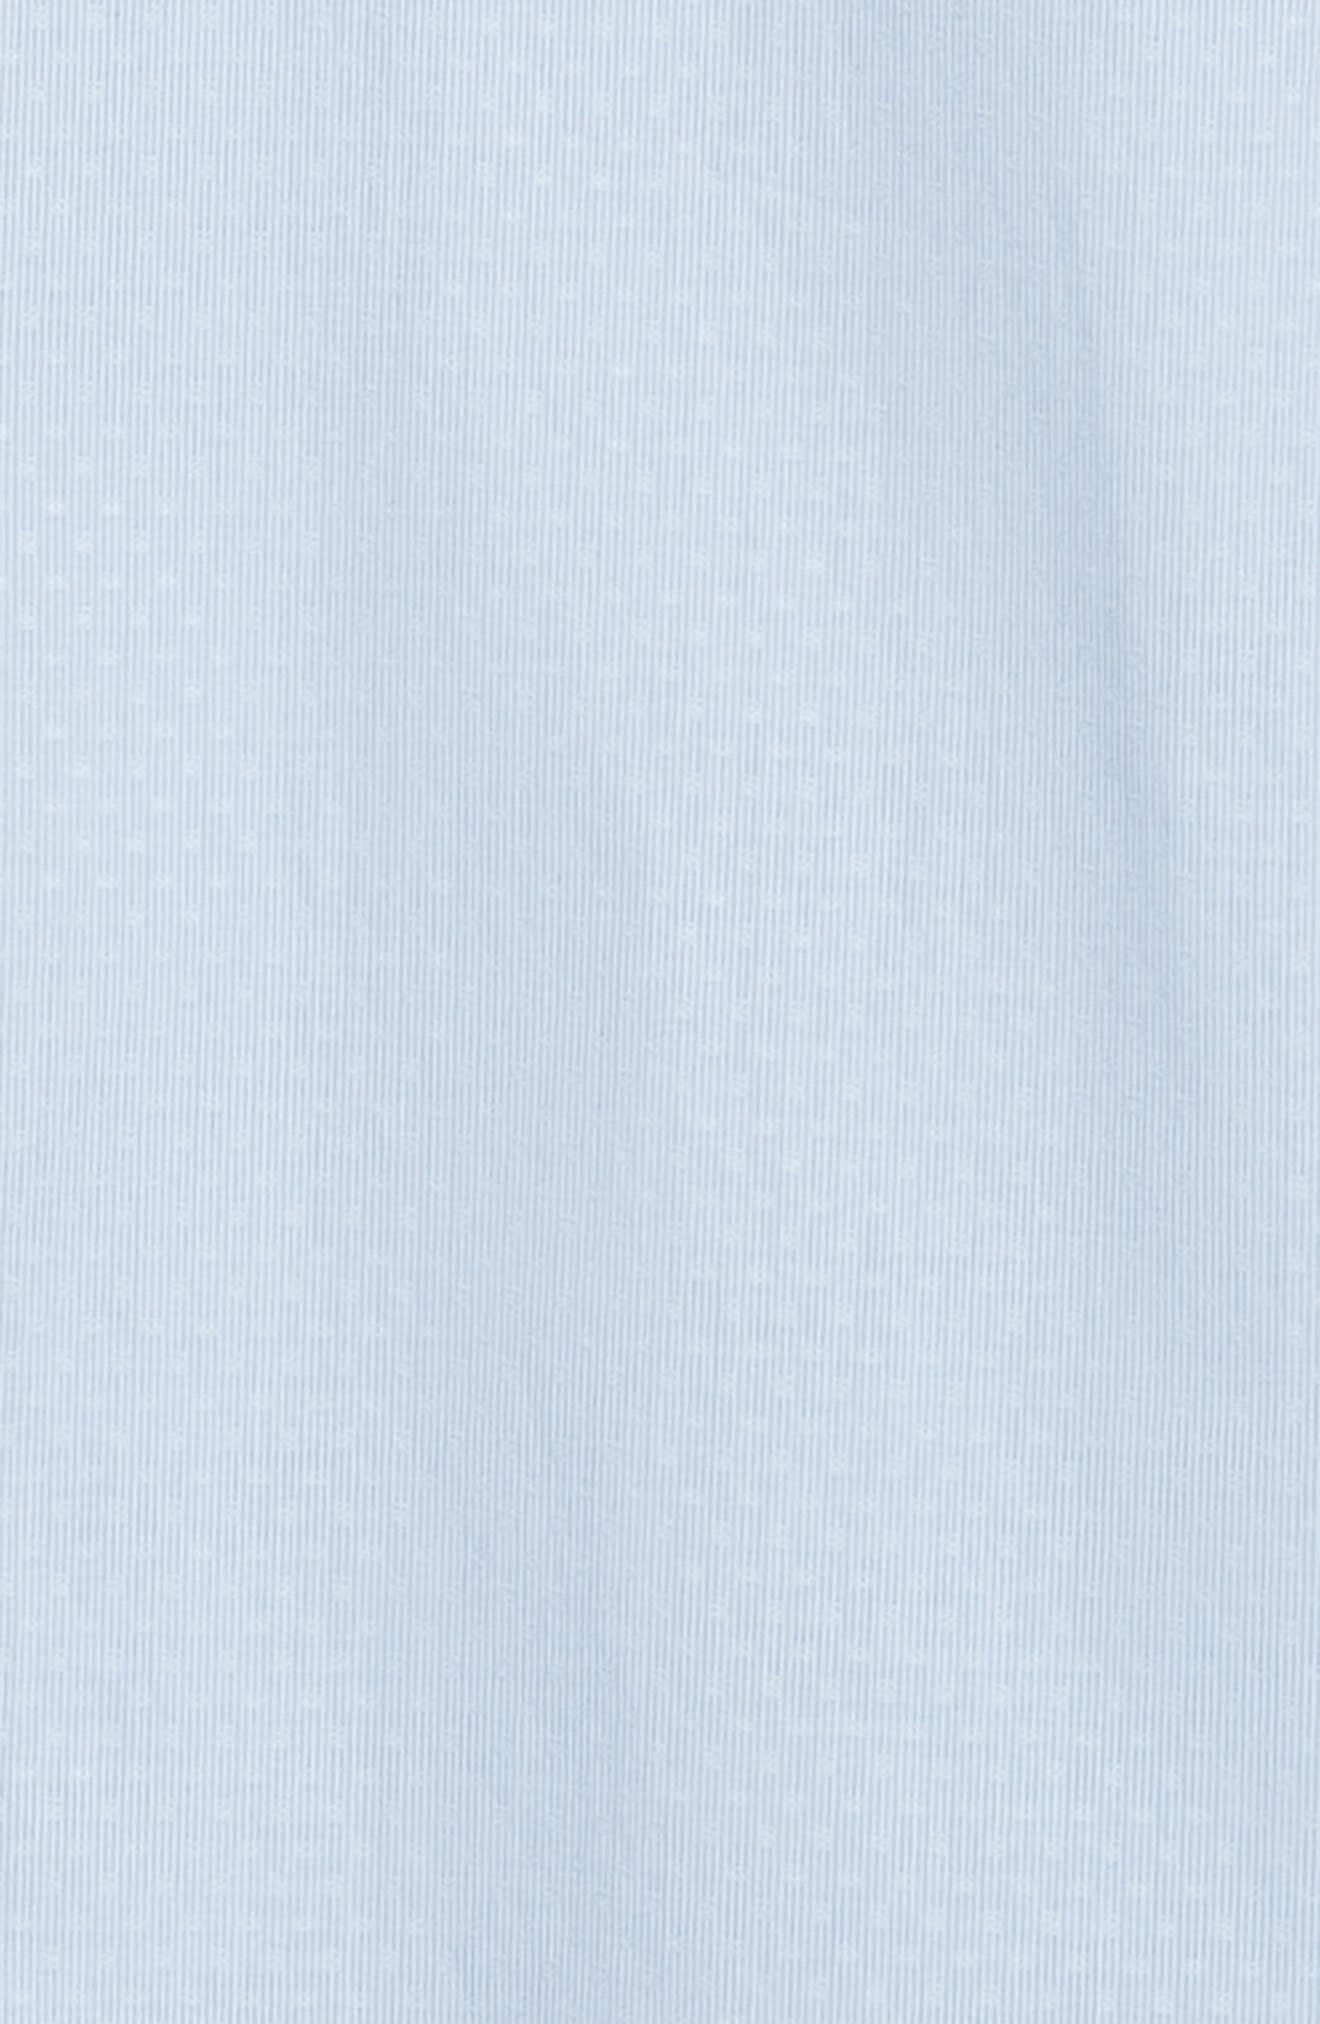 Regular Fit Stripe Dress Shirt,                             Alternate thumbnail 6, color,                             CLOUD